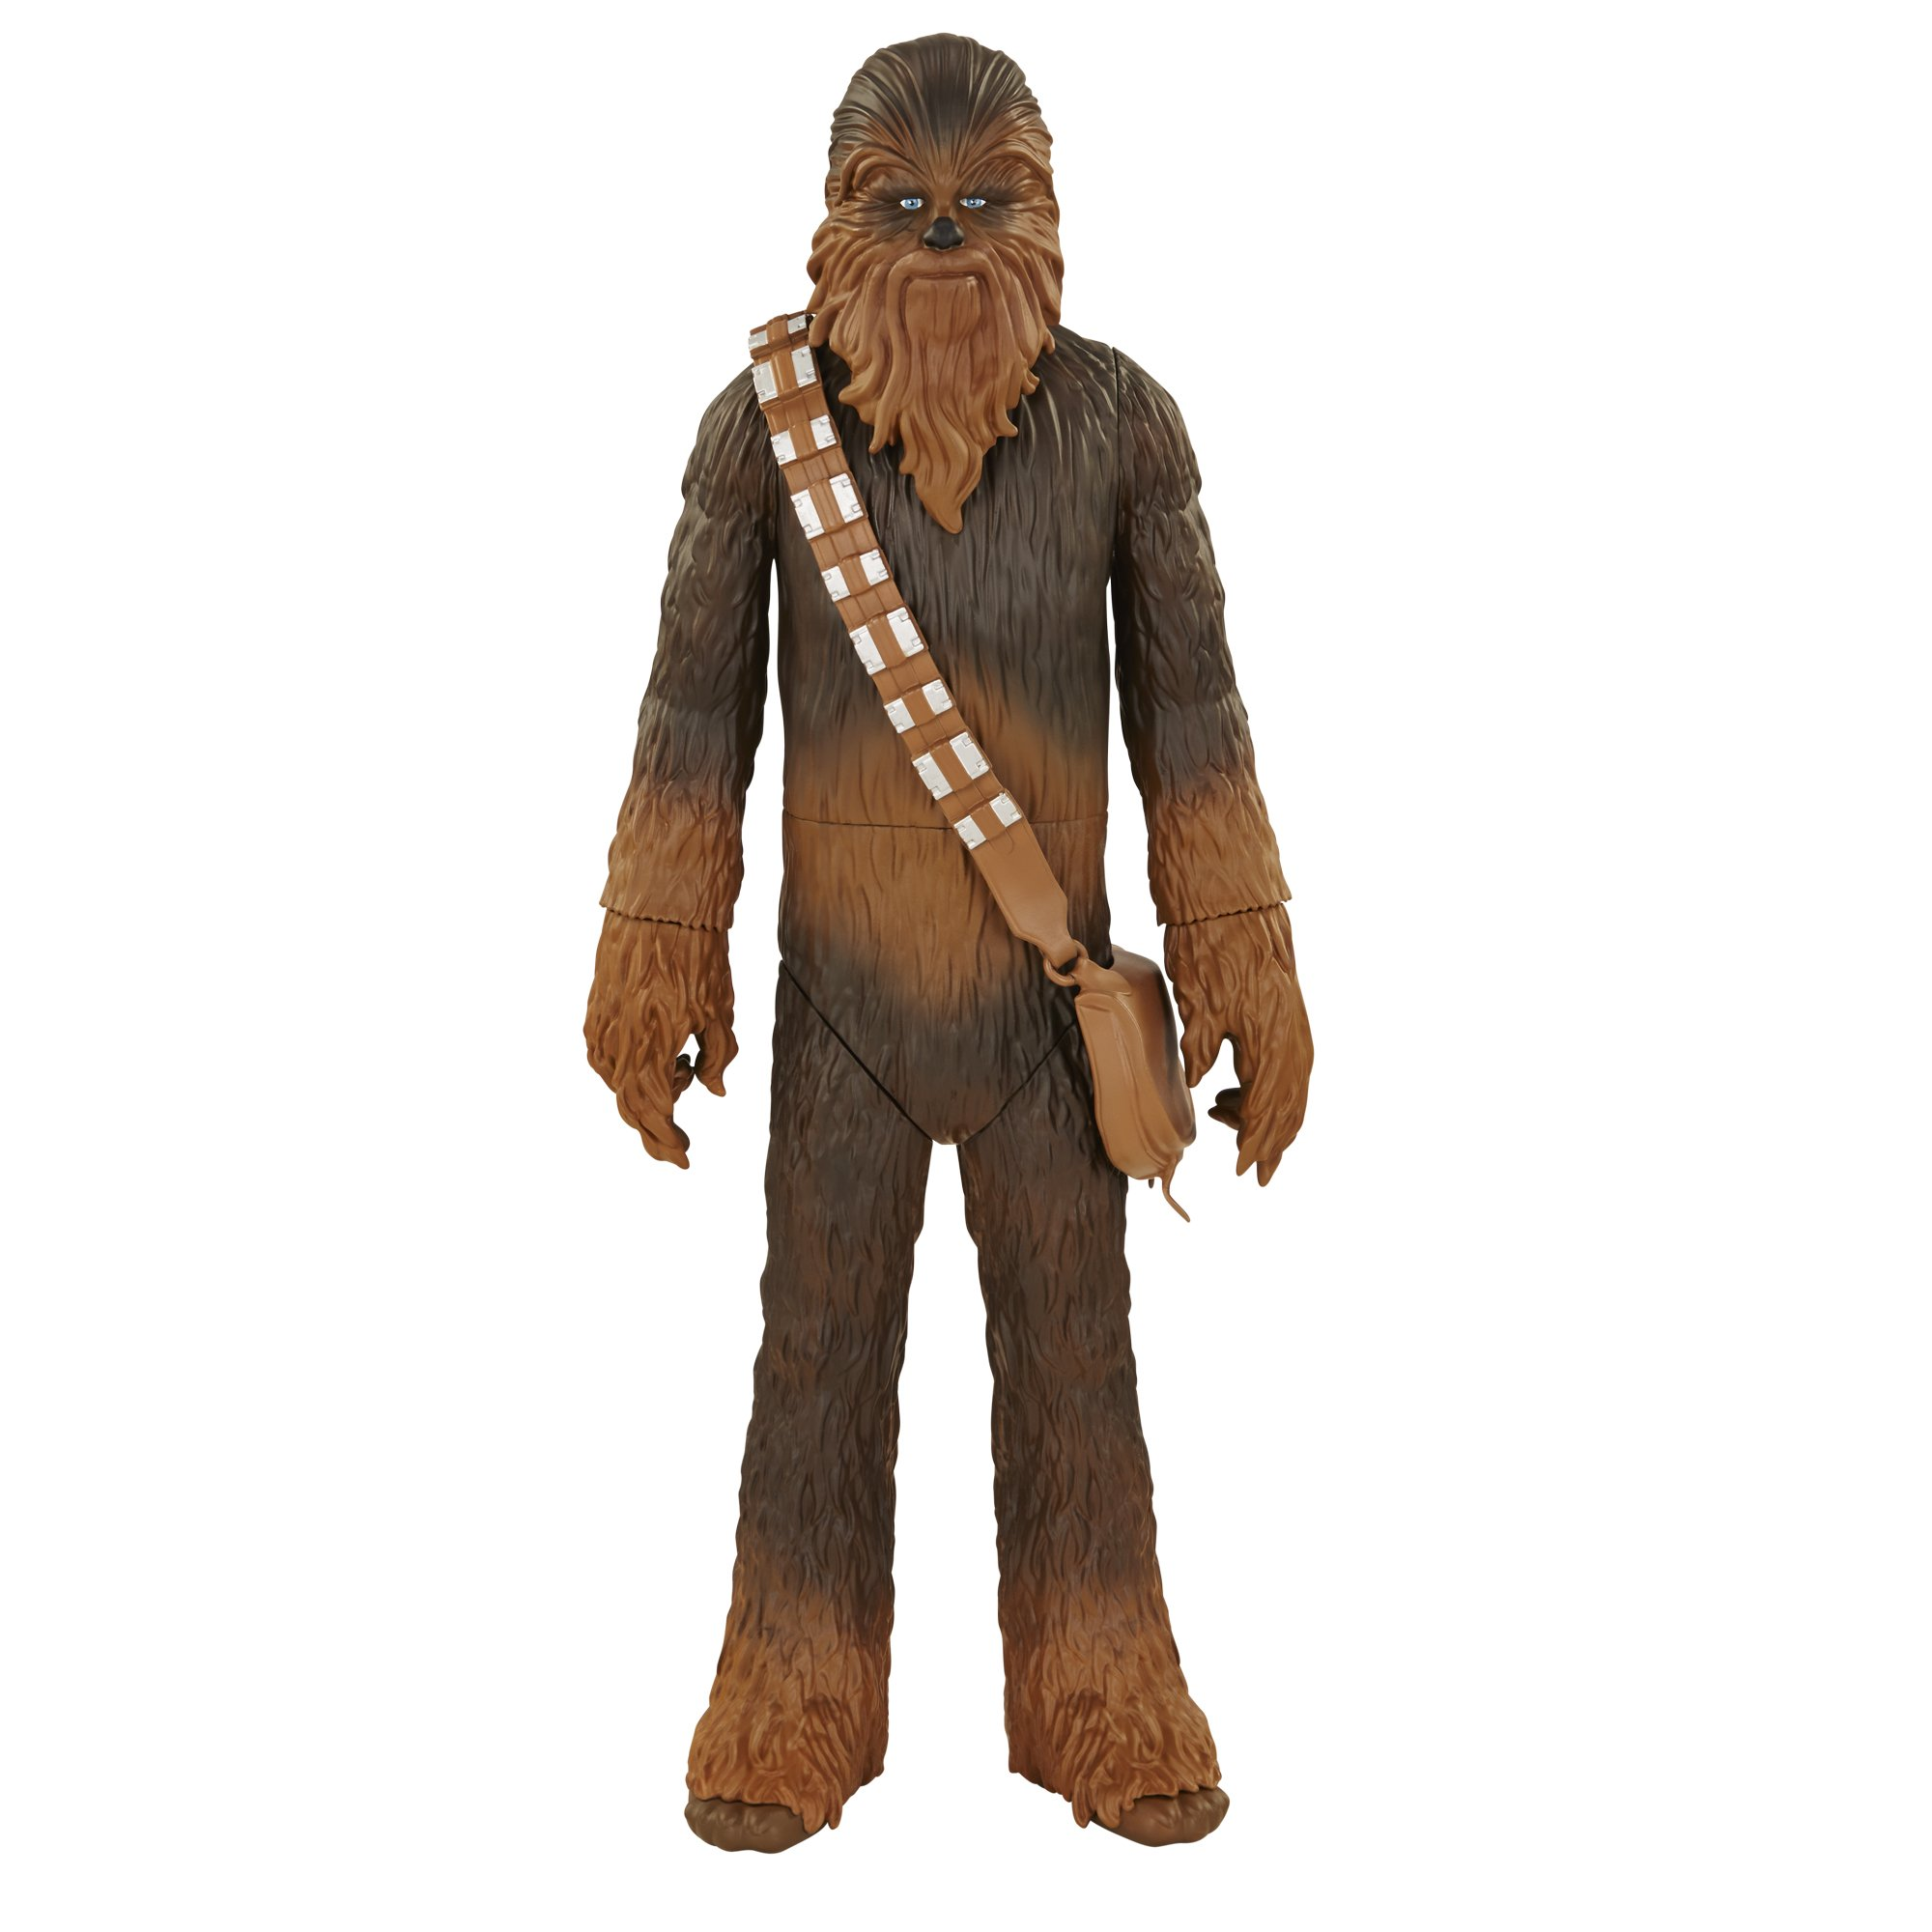 star wars chewbacca 50 cm action figurine jakks. Black Bedroom Furniture Sets. Home Design Ideas